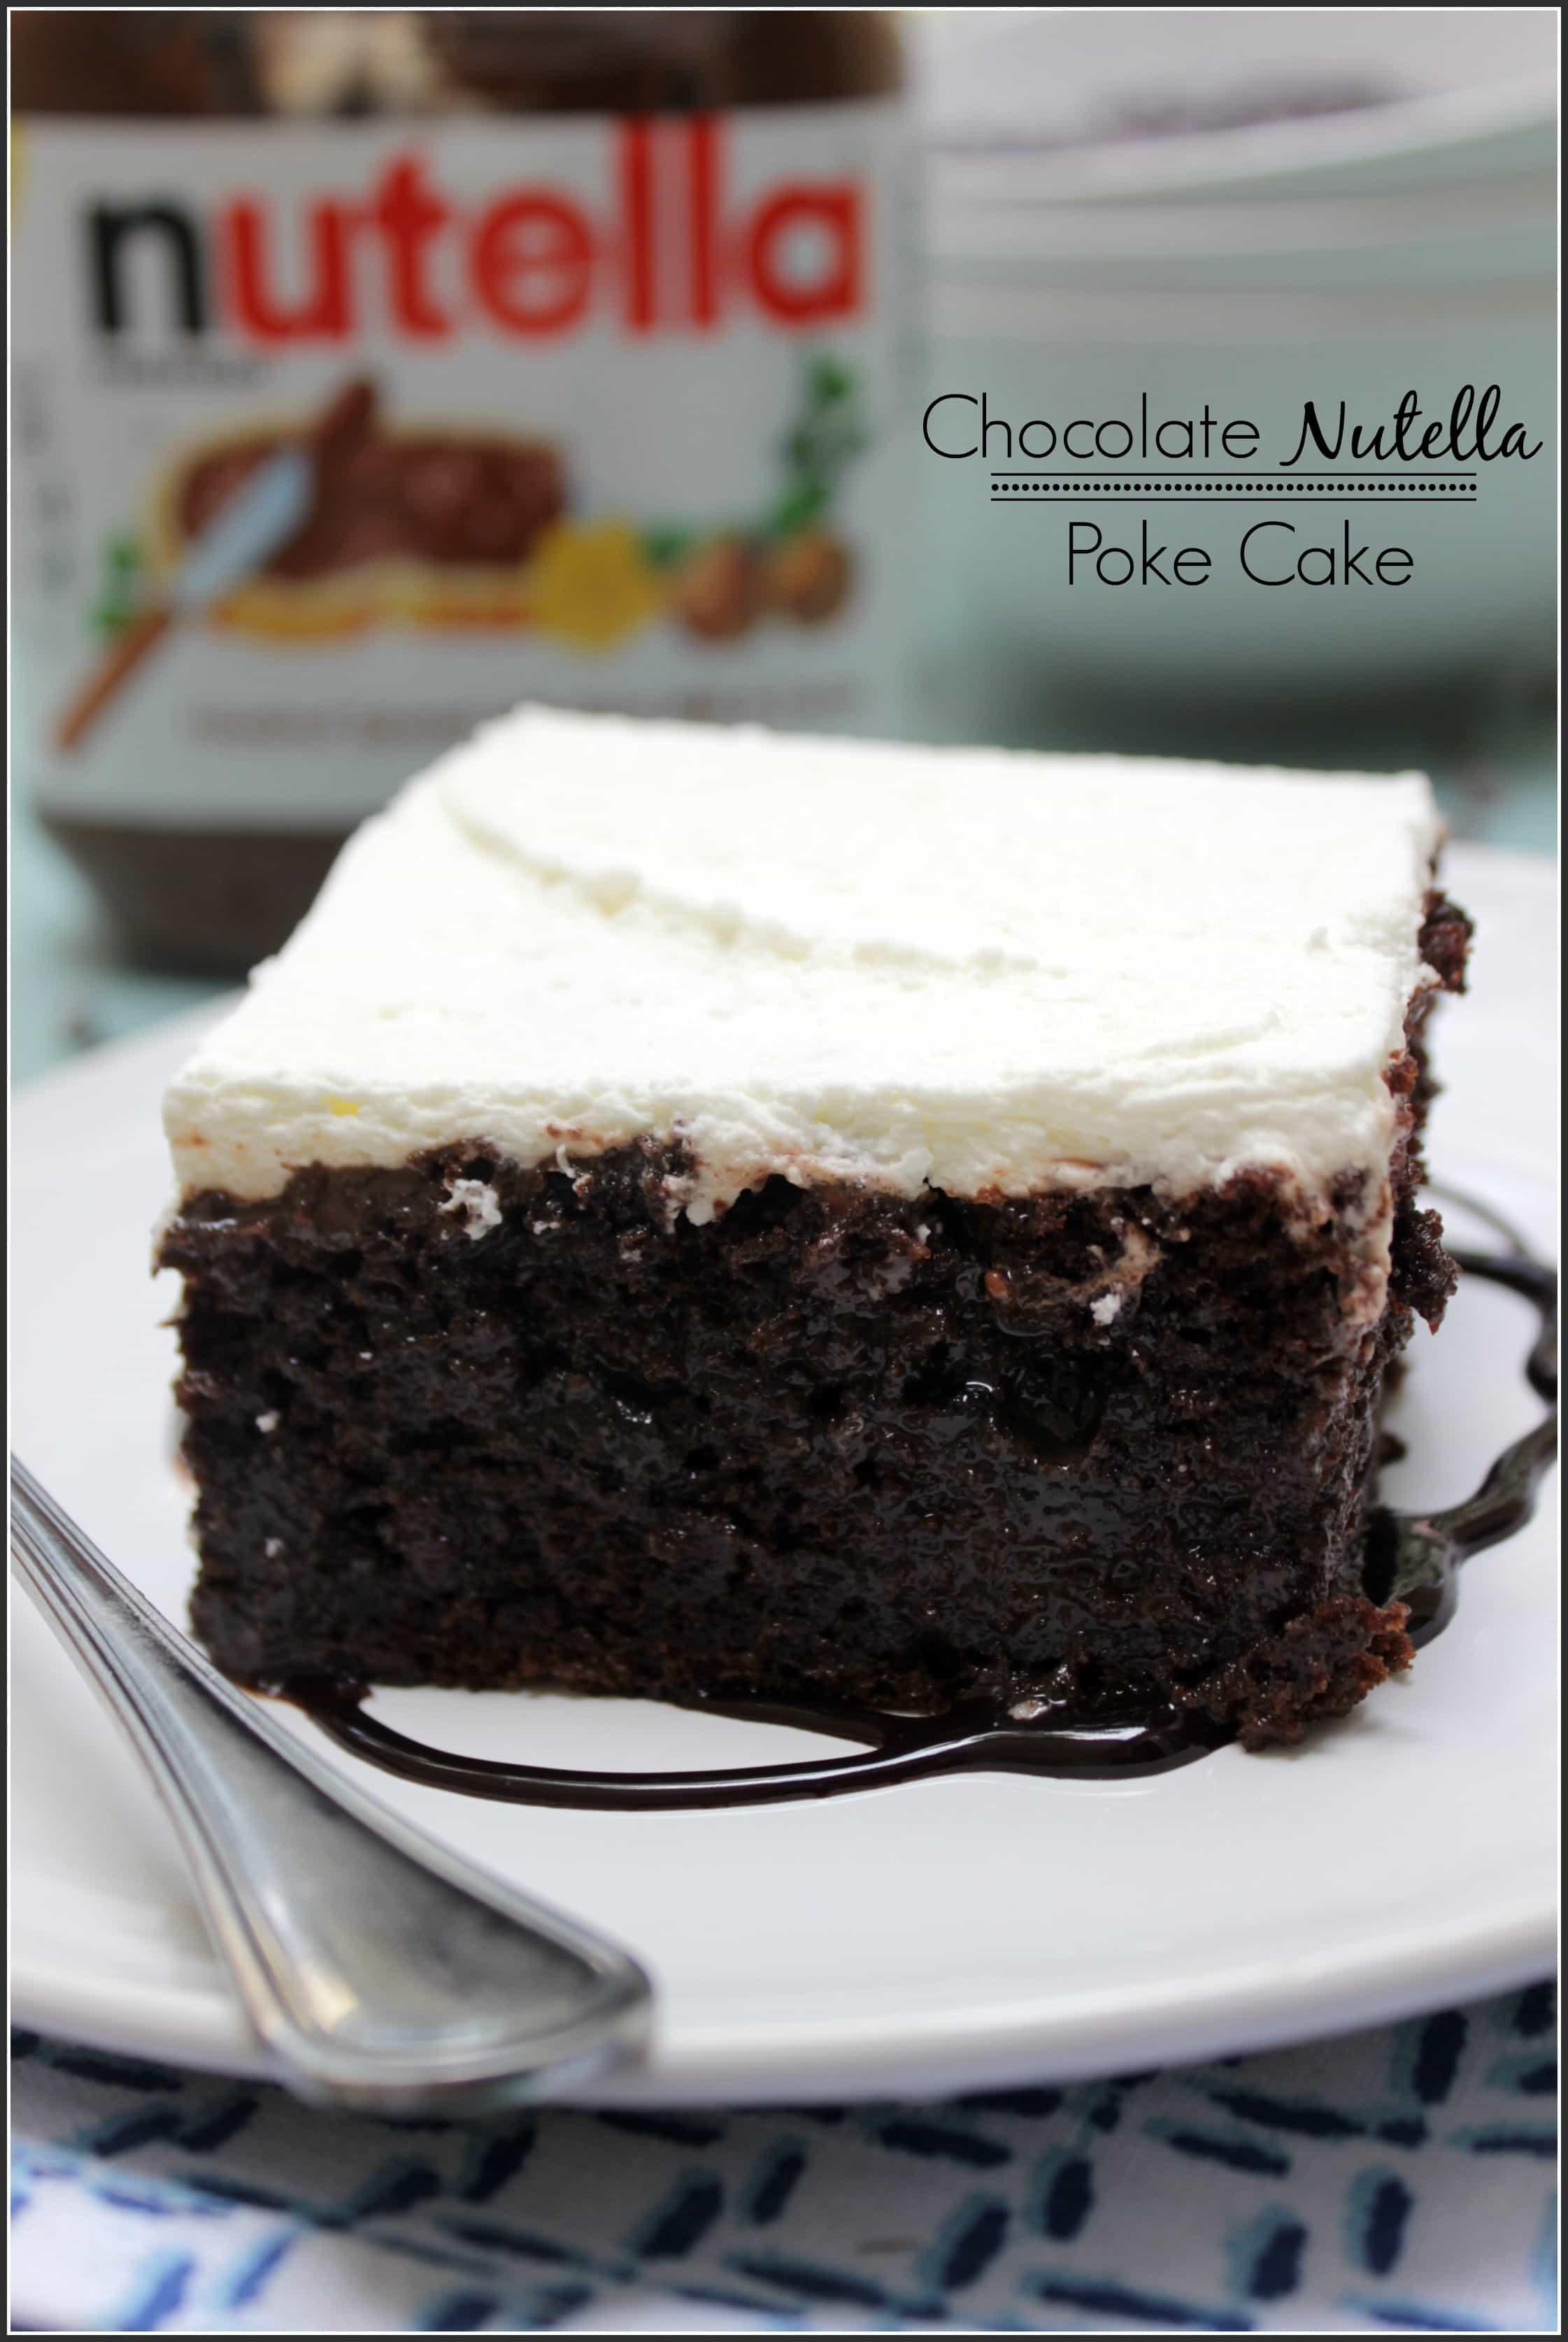 Chocolate Nutella Poke Cake Main